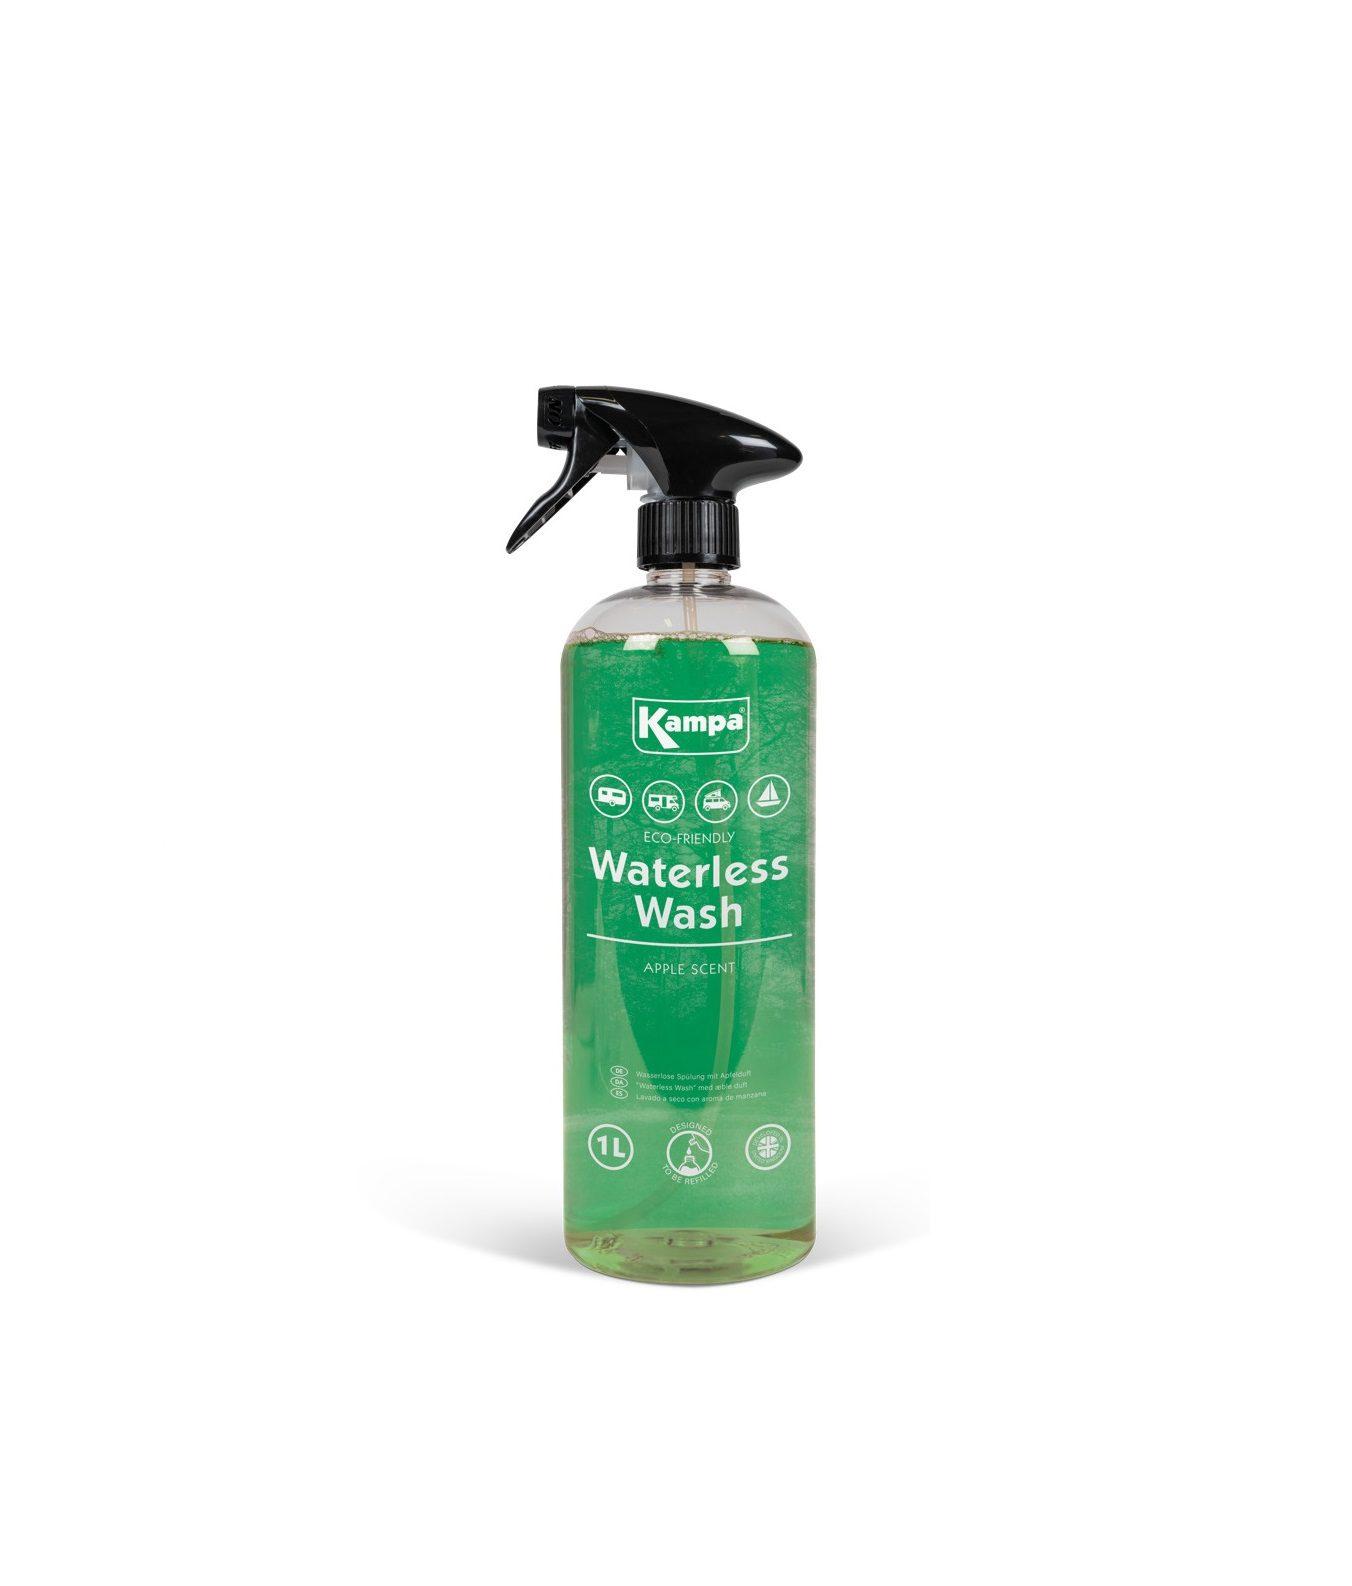 Kampa Waterless Wash